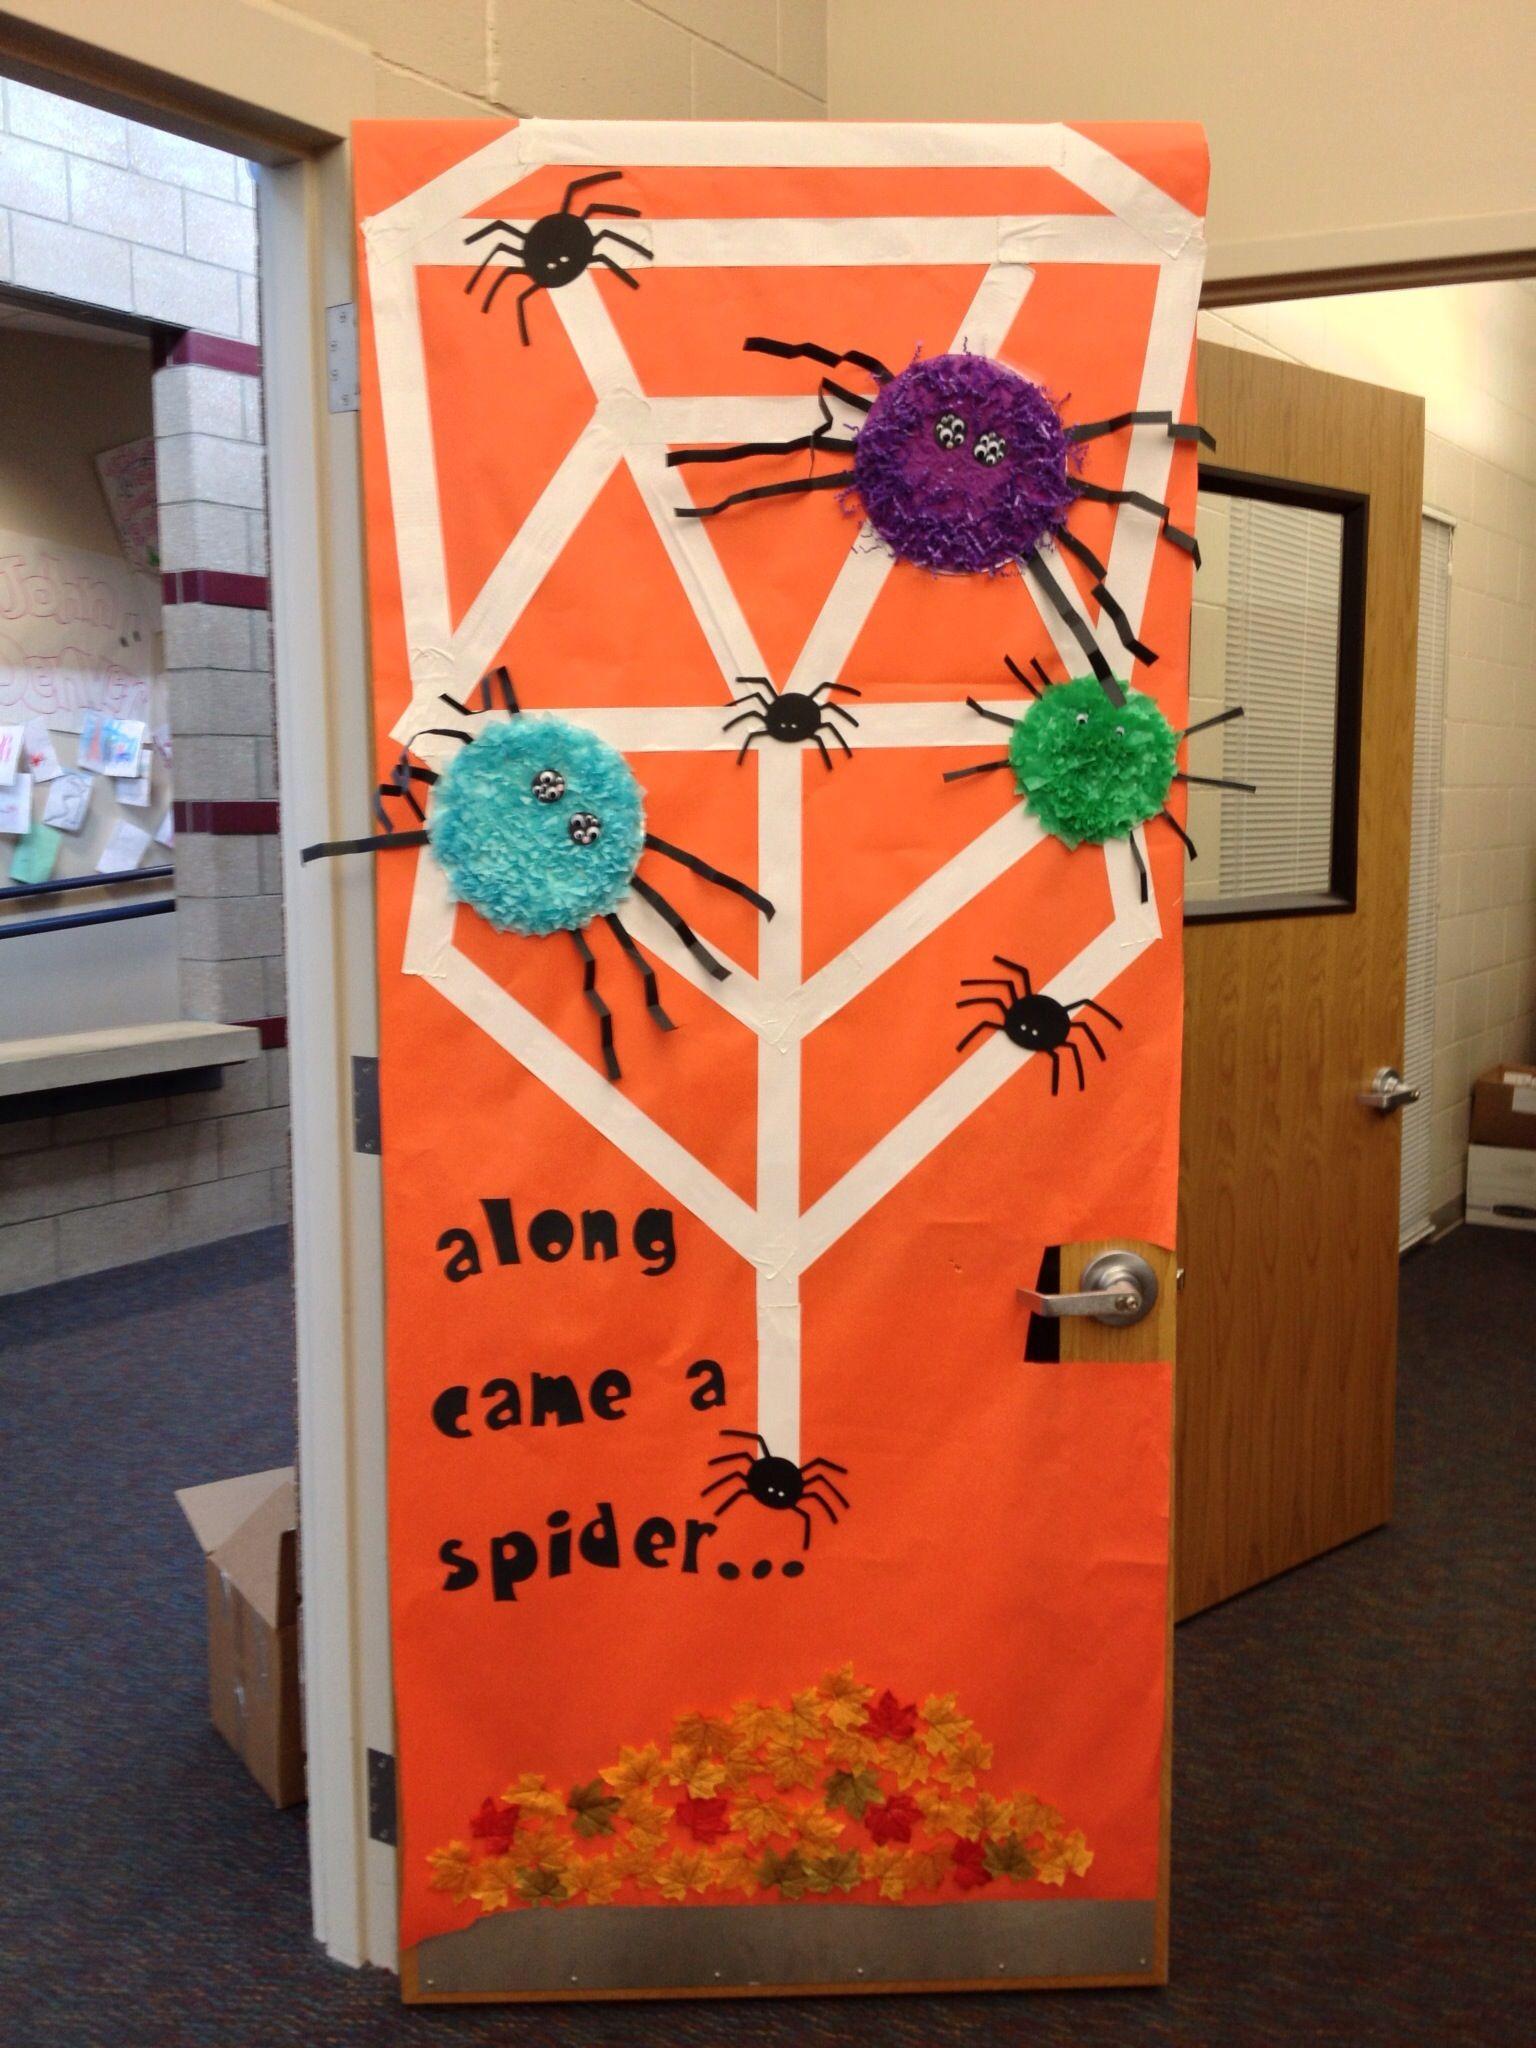 Halloween Door Decorating Contest Cool If Our Faces The Spiders Instead Halloween Door Decorations Fall Door Decorations School Door Decorations